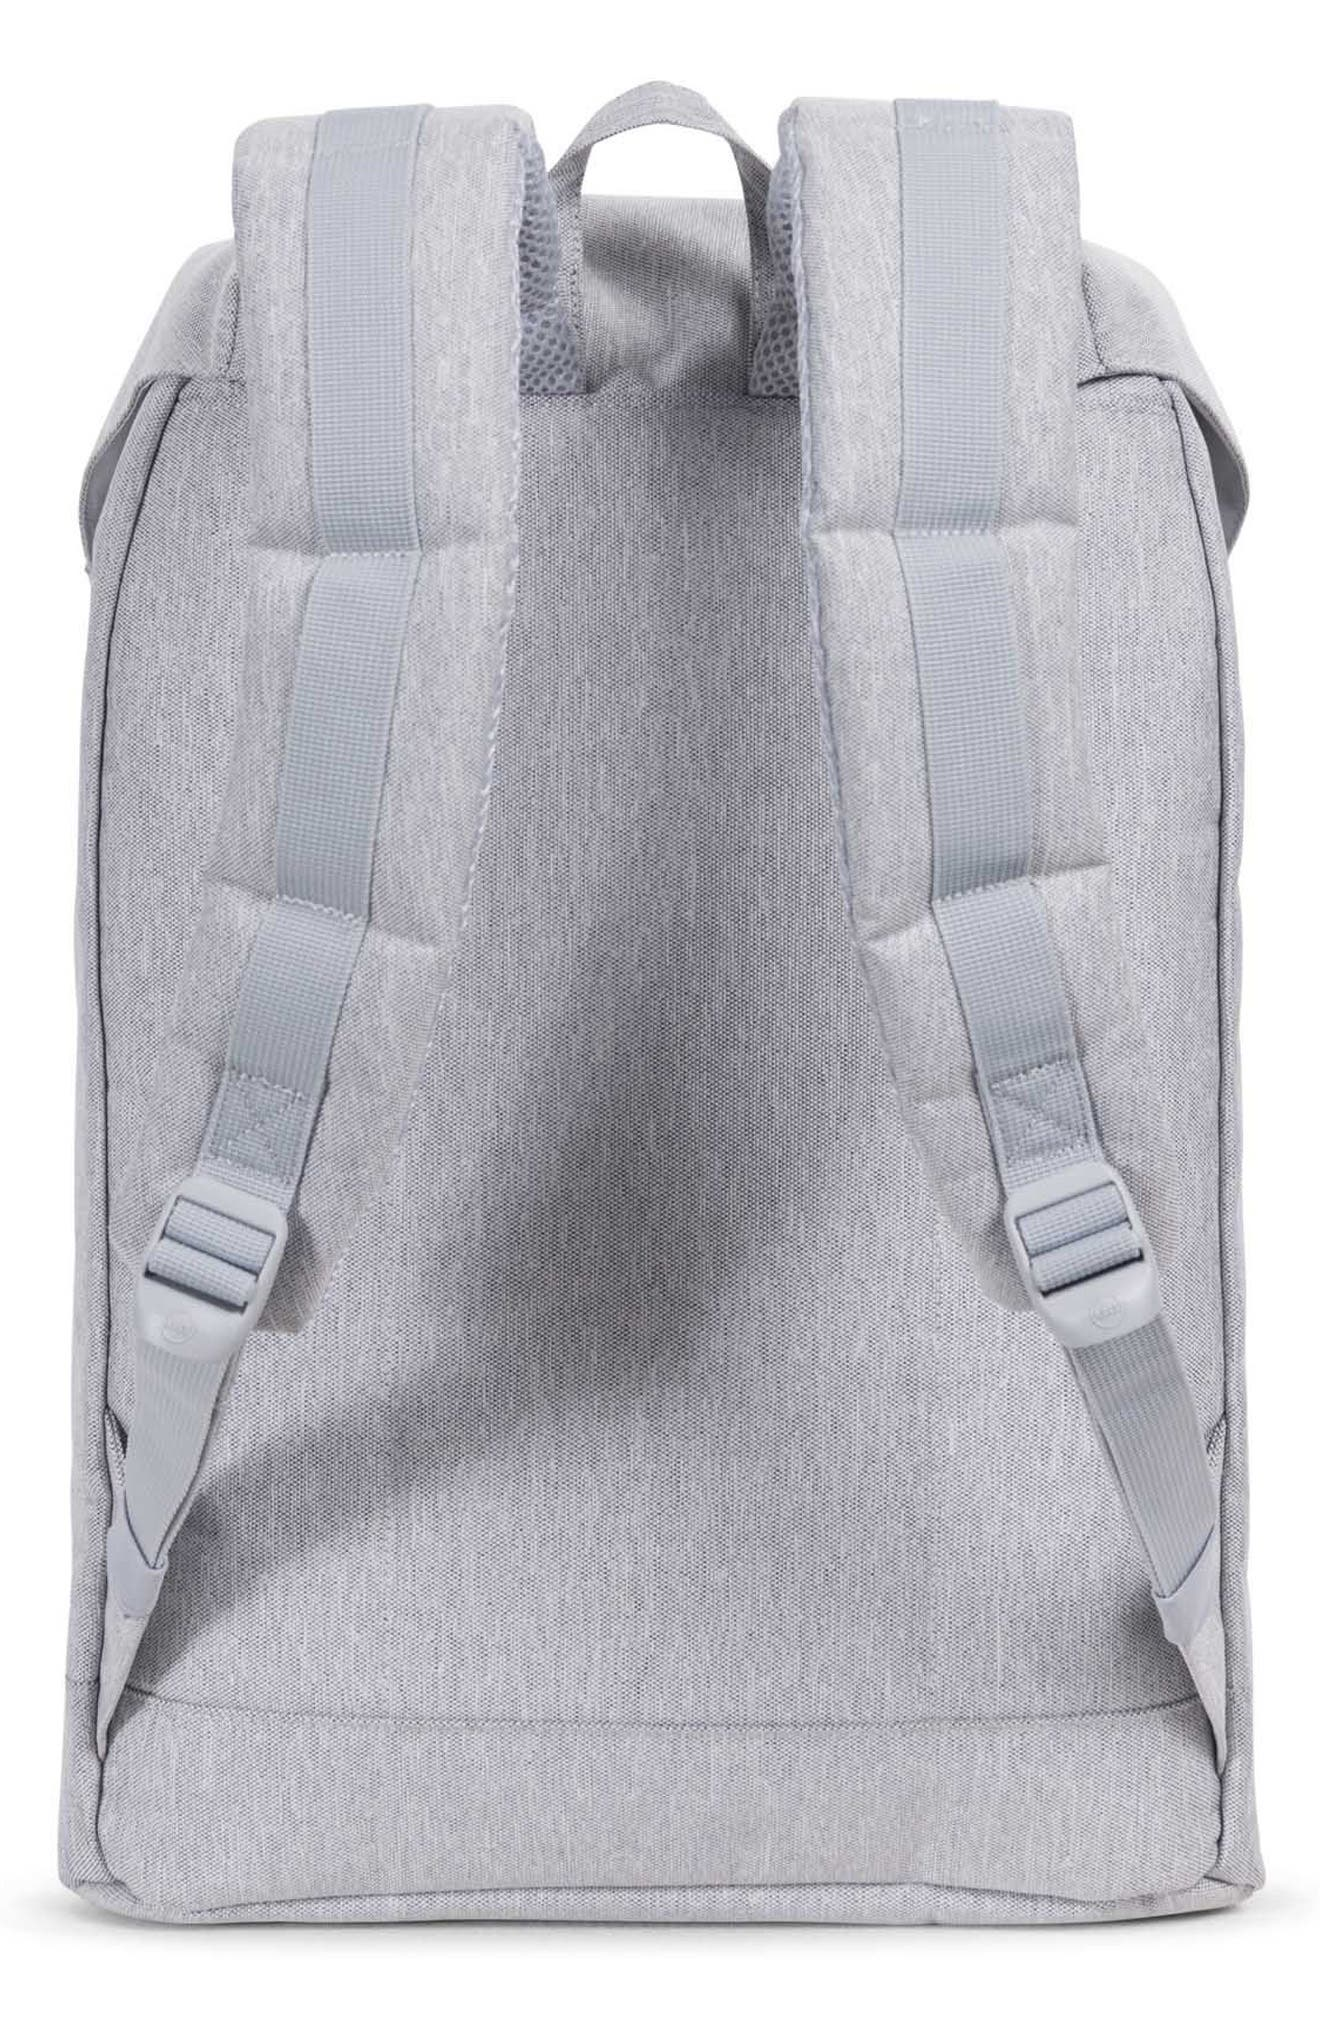 'Retreat' Backpack,                             Alternate thumbnail 2, color,                             Light Grey Crosshatch/ White